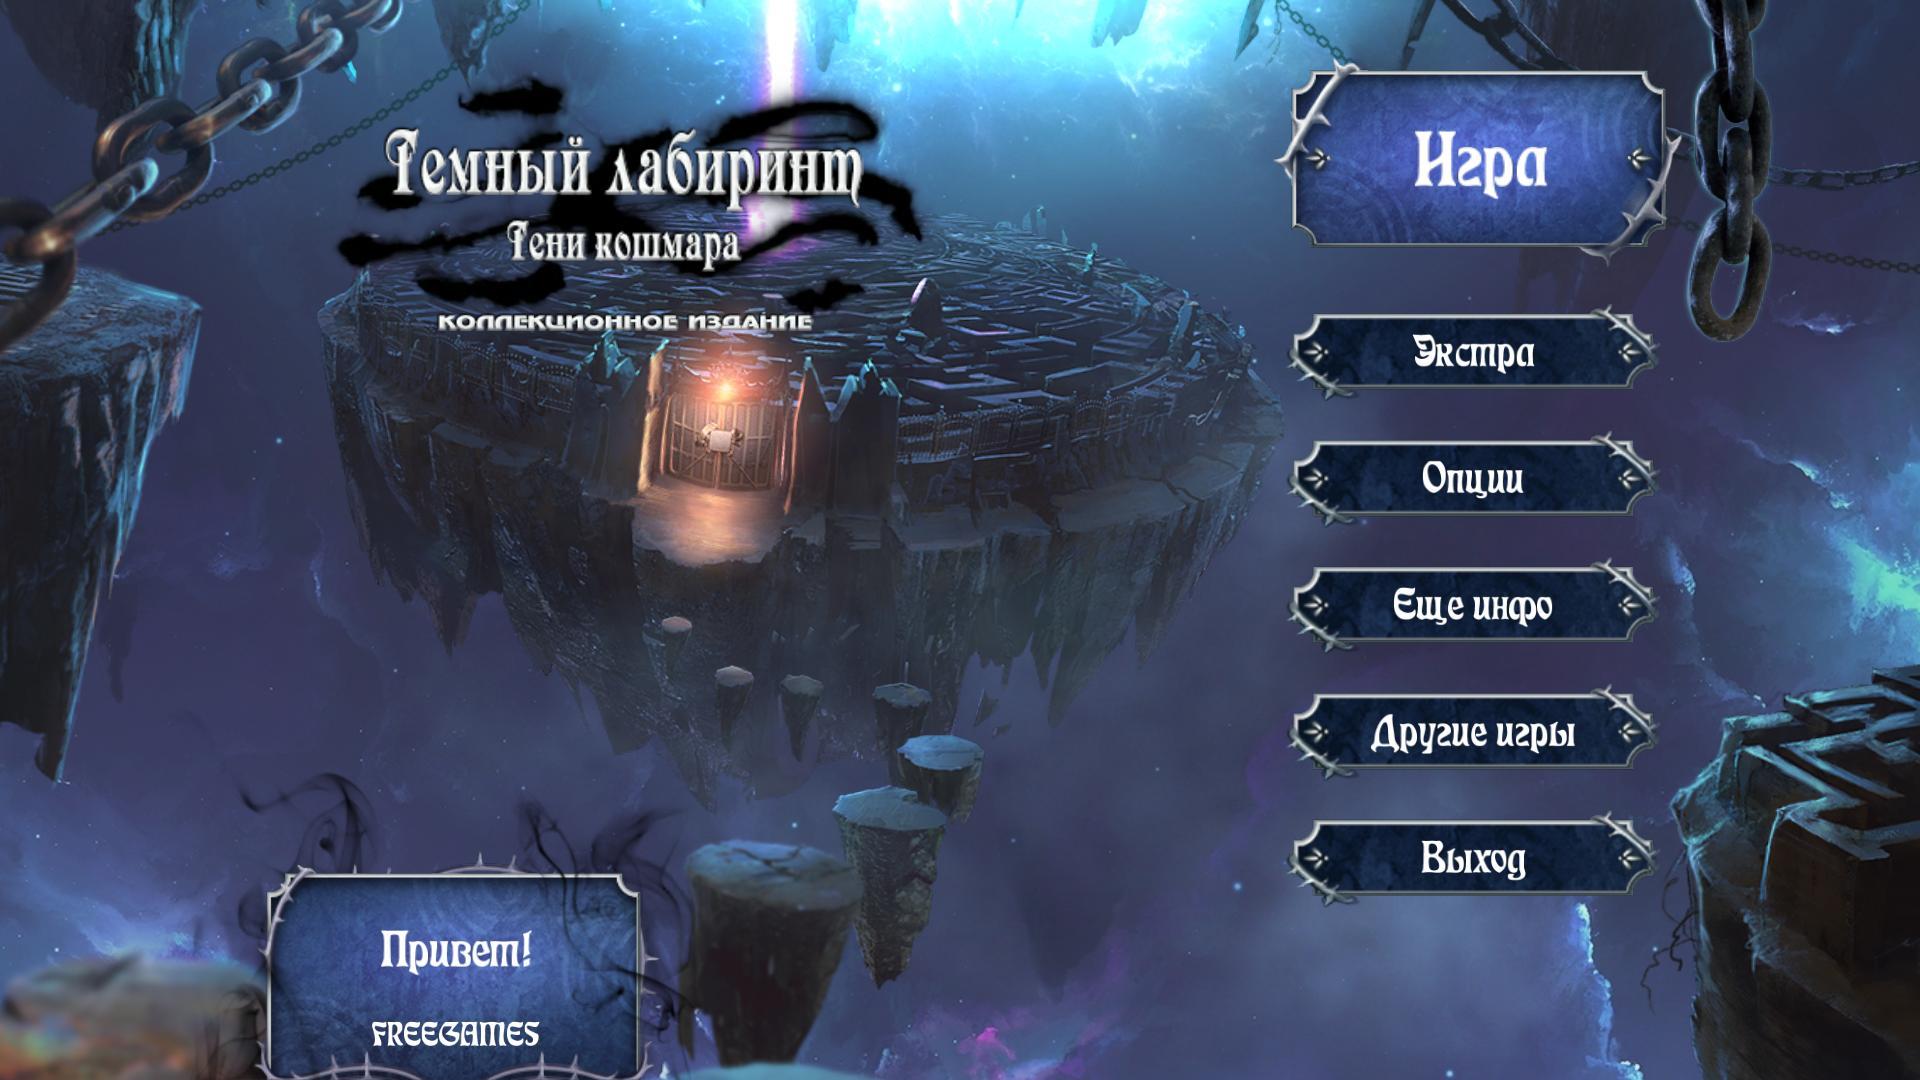 Темный лабиринт 7: Тени кошмара. Коллекционное издание | Sable Maze 7: Nightmare Shadows CE (Rus)